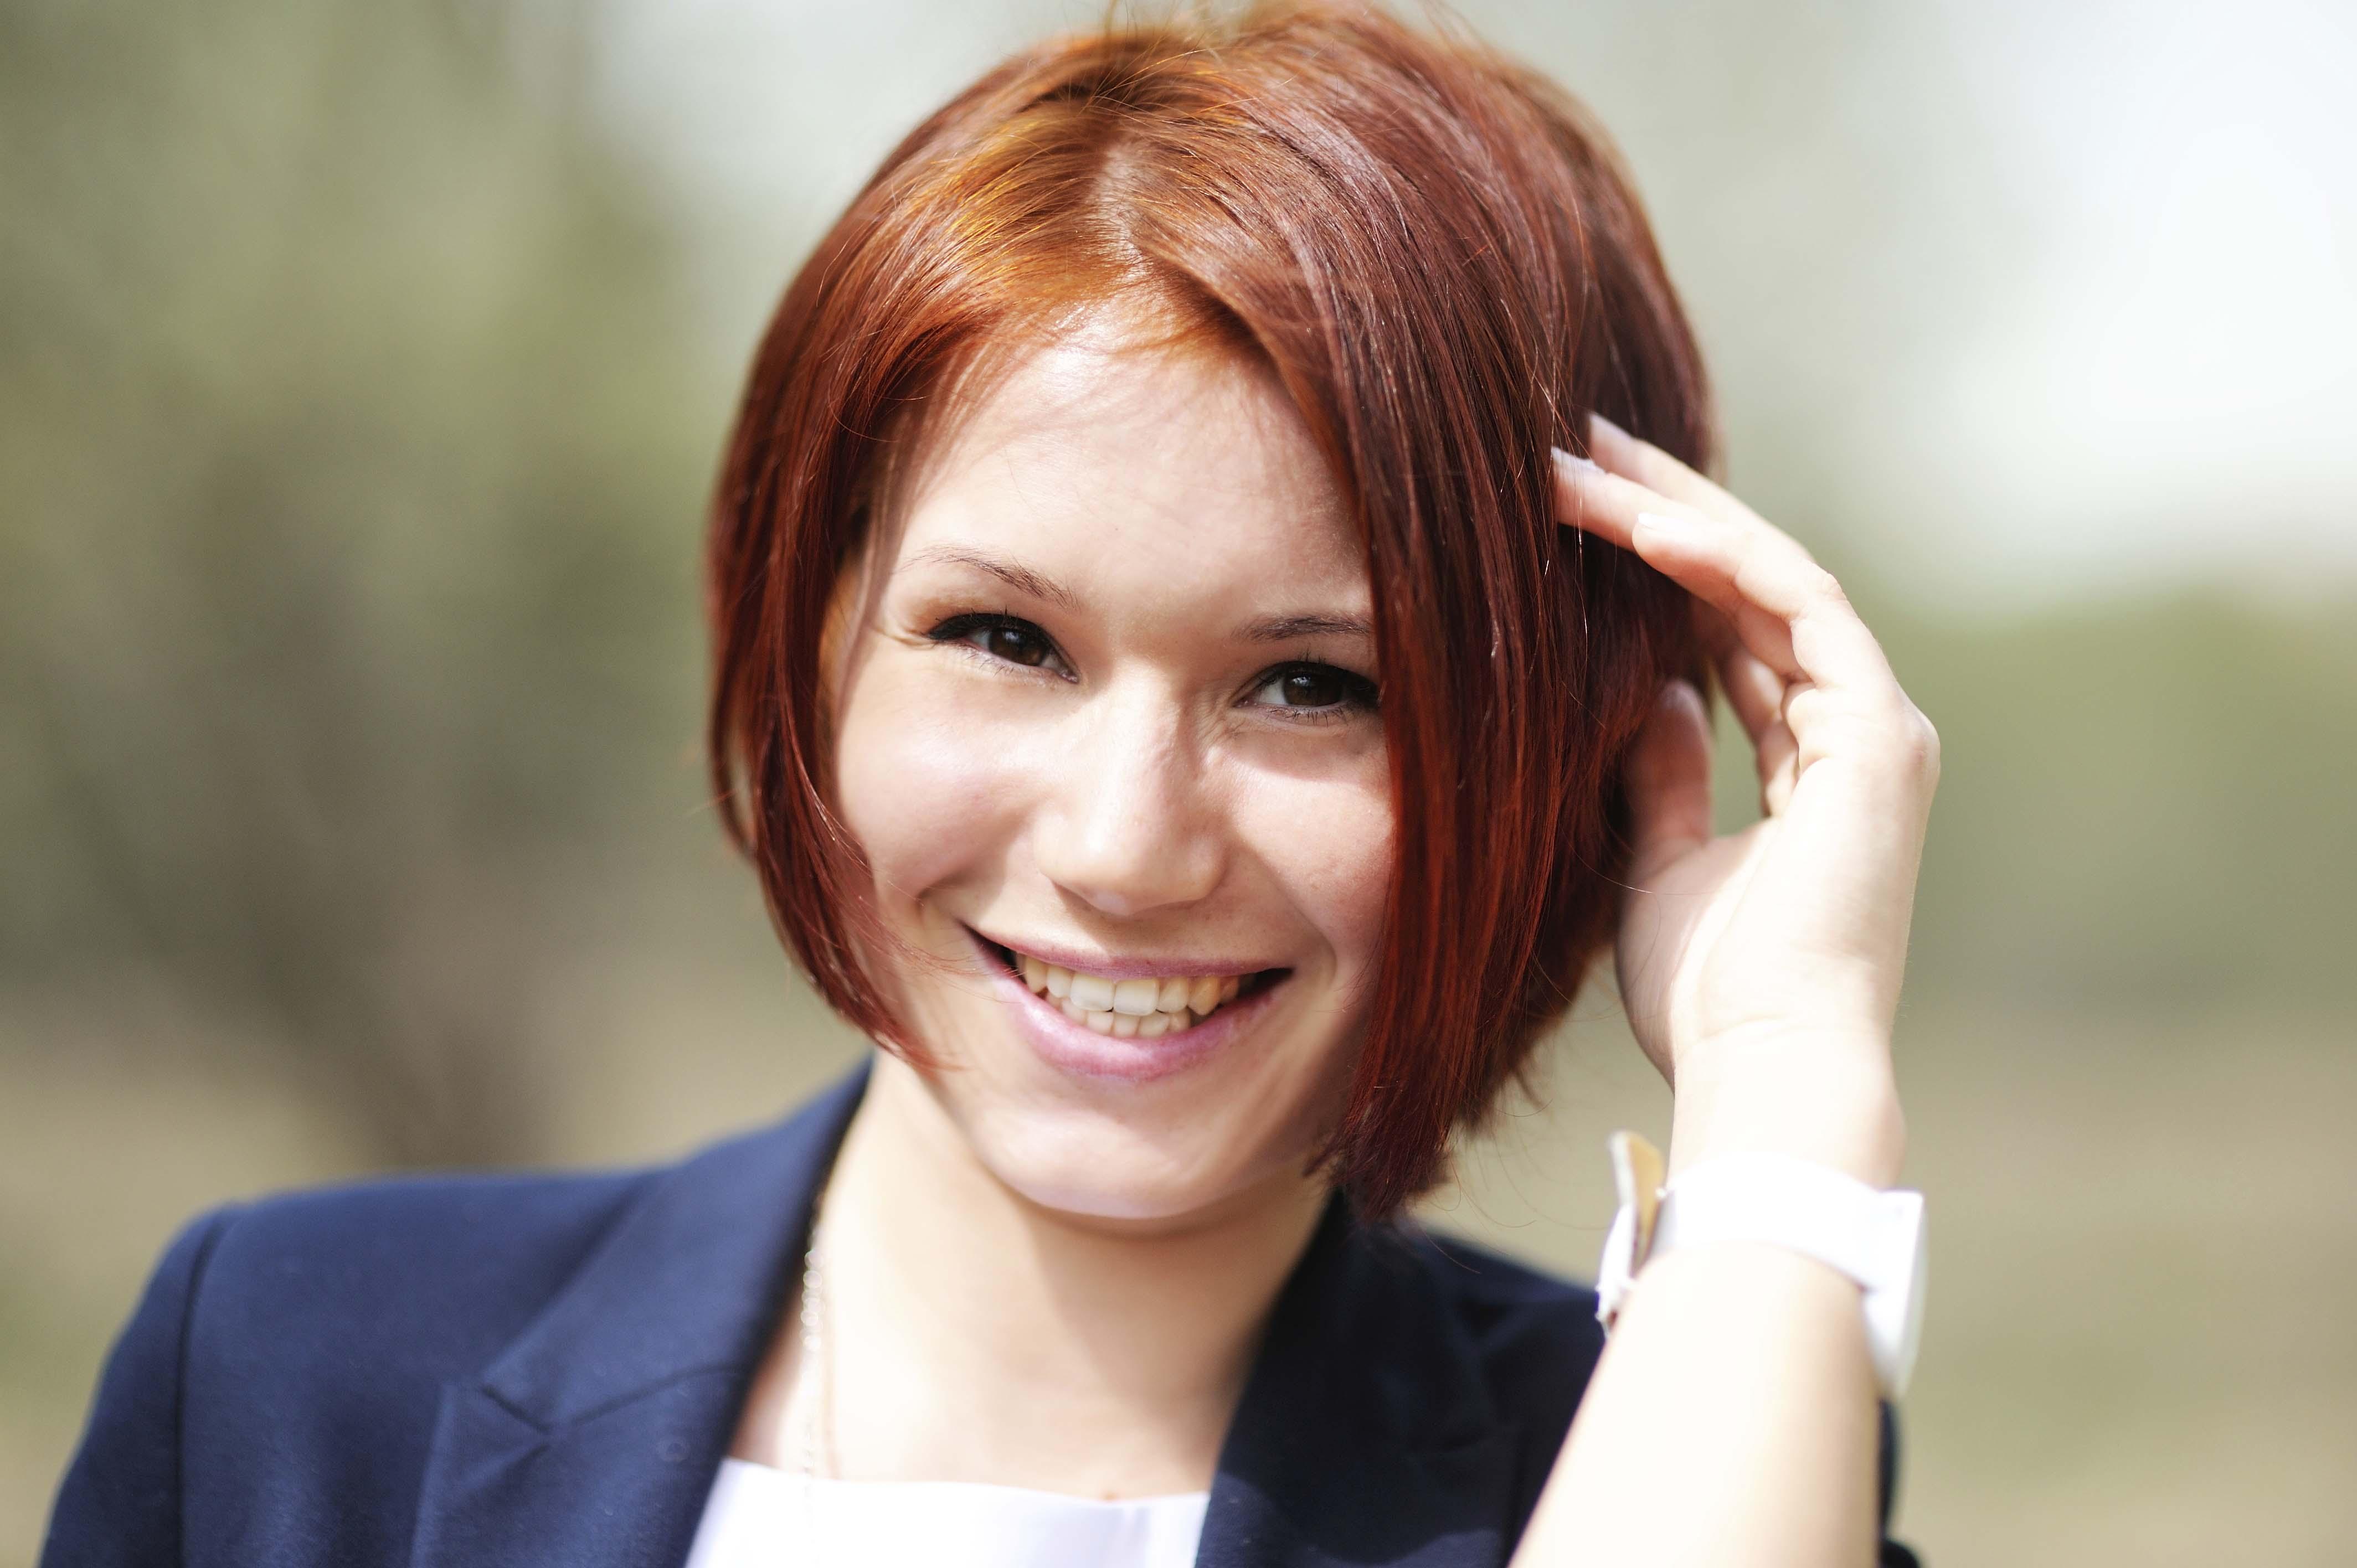 Short haircuts for women we love: the asymmetrical crop